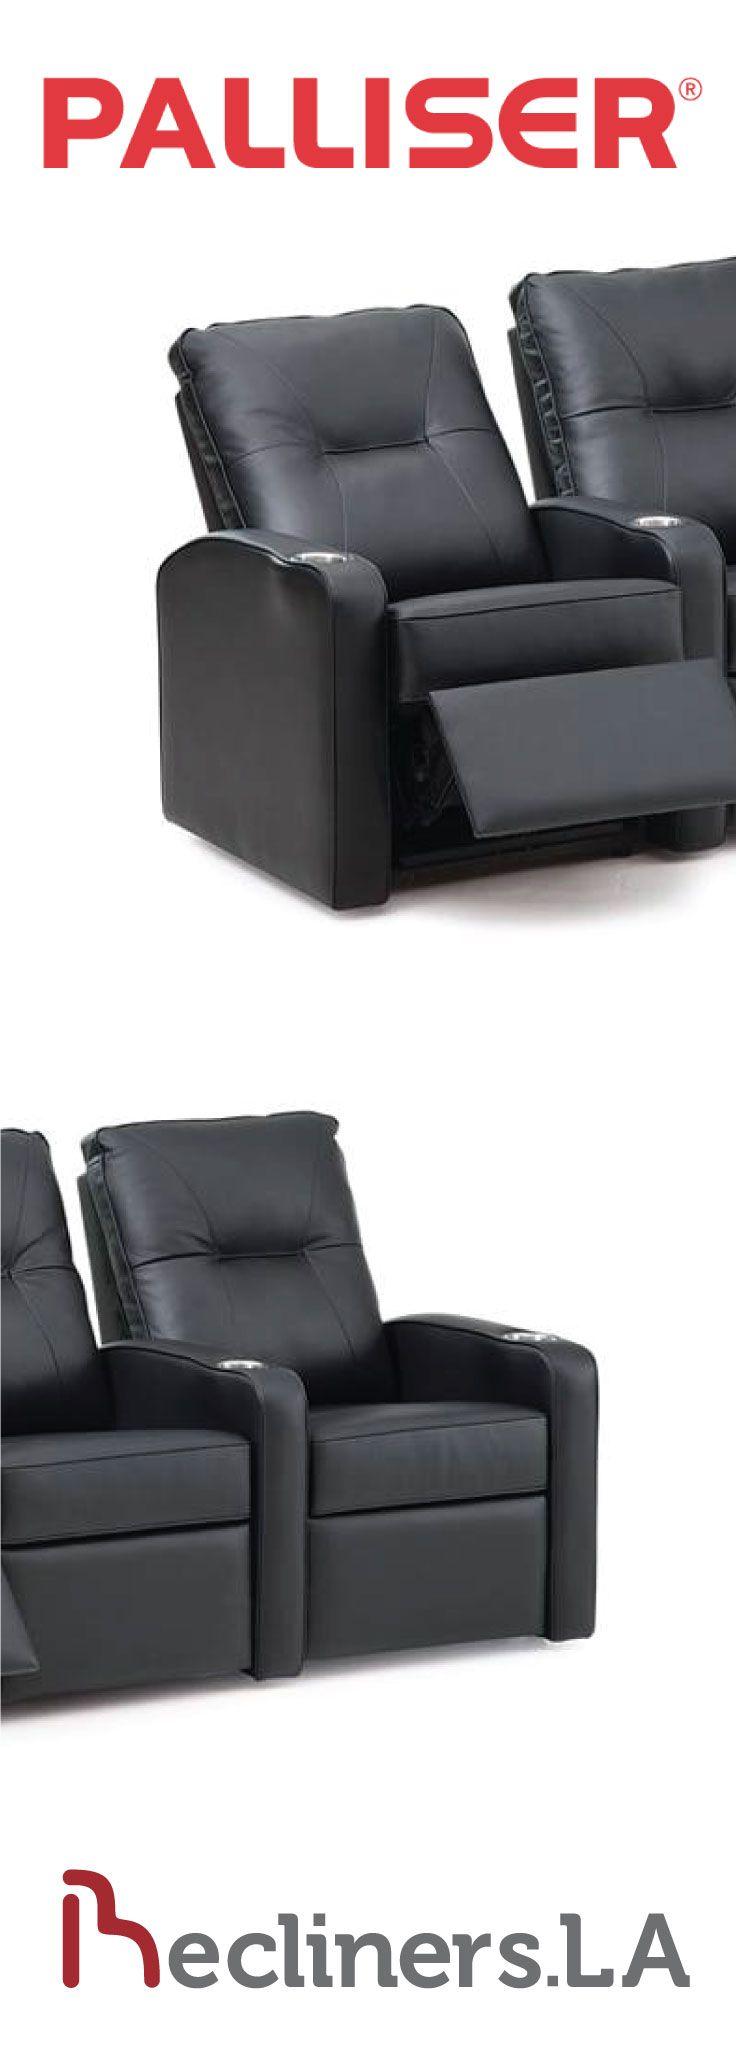 Palliser Leather Sofa Reclining Integrated Footrest Ottoman Http Www